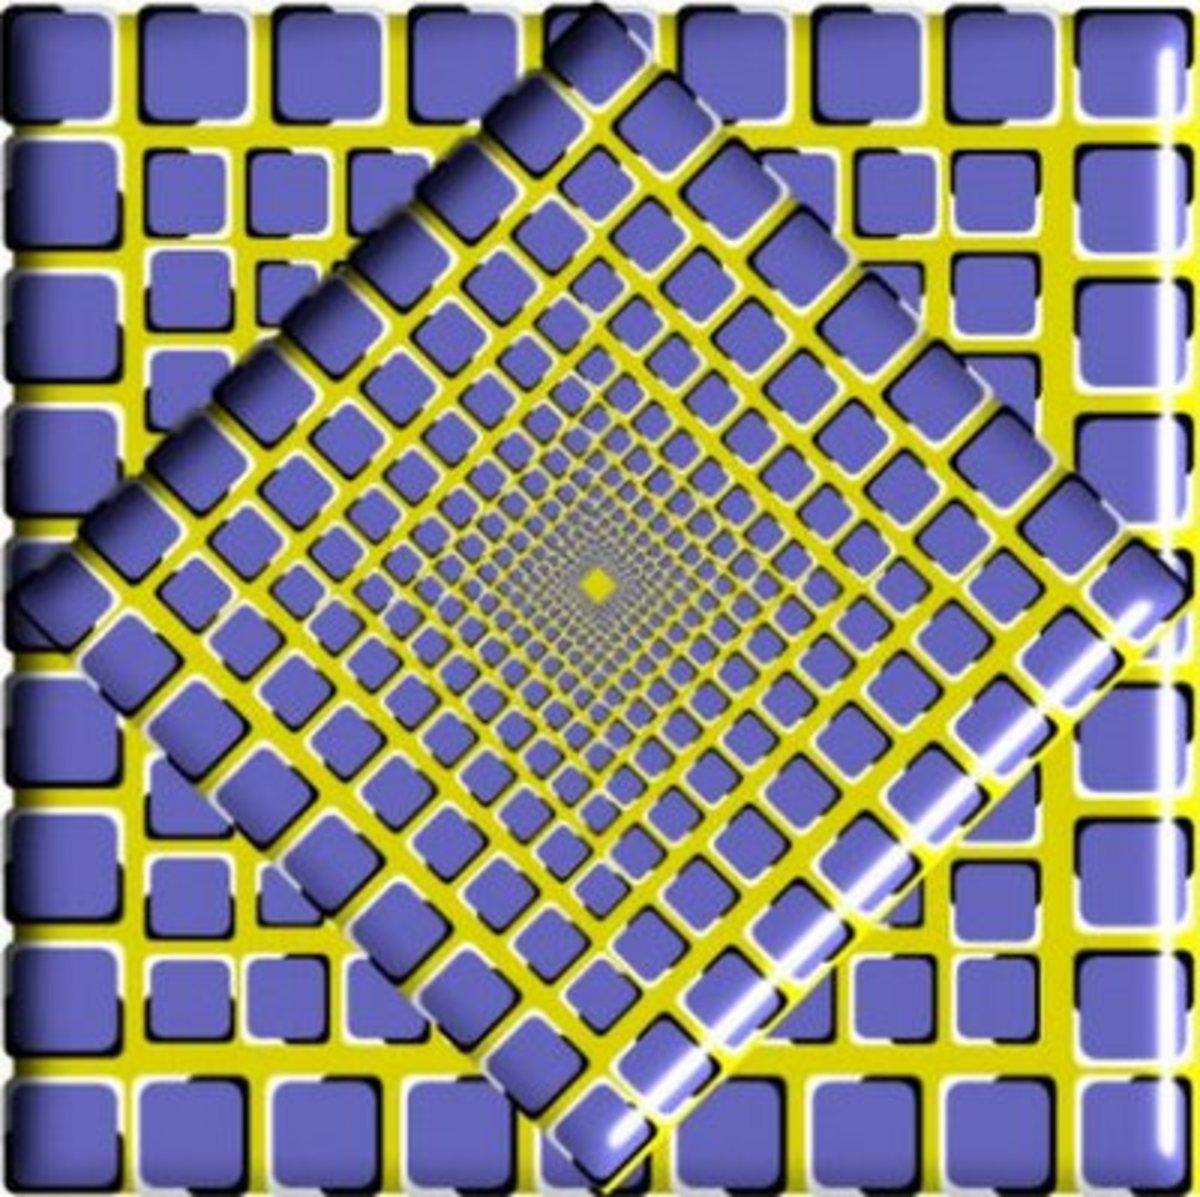 Optical visual illusion with rotating squares